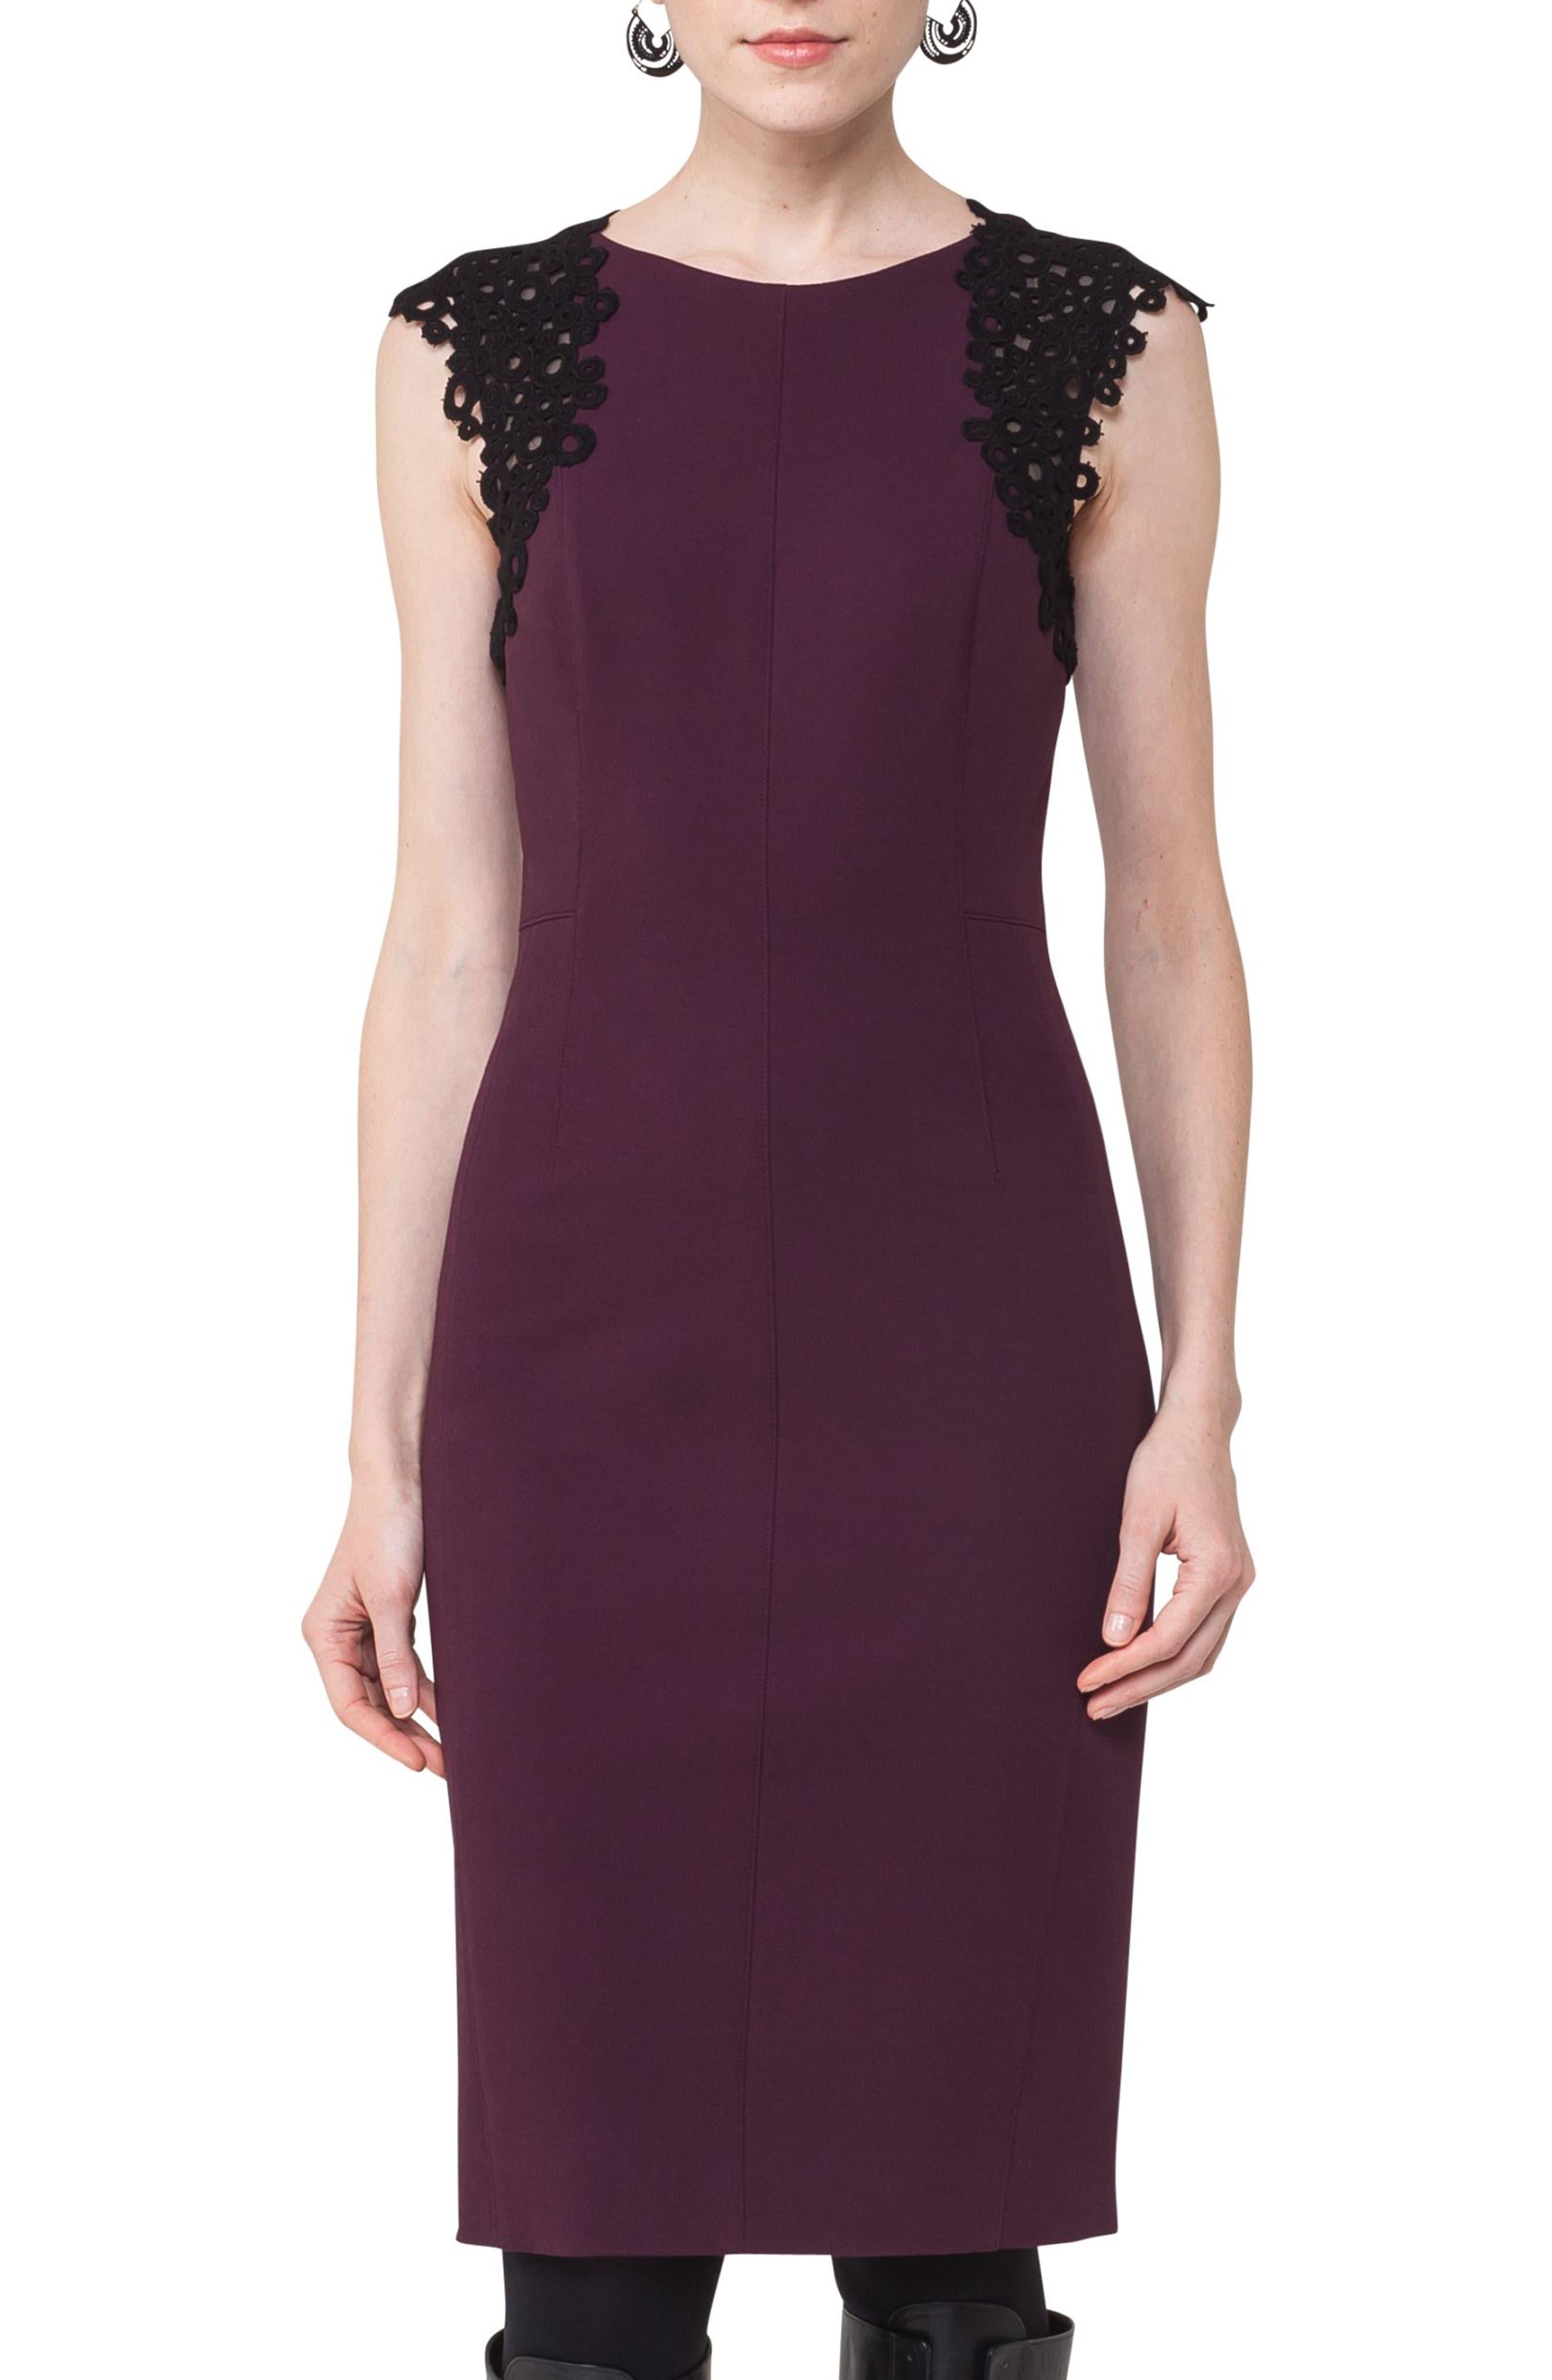 Lace Trim Sheath Dress,                             Alternate thumbnail 4, color,                             930